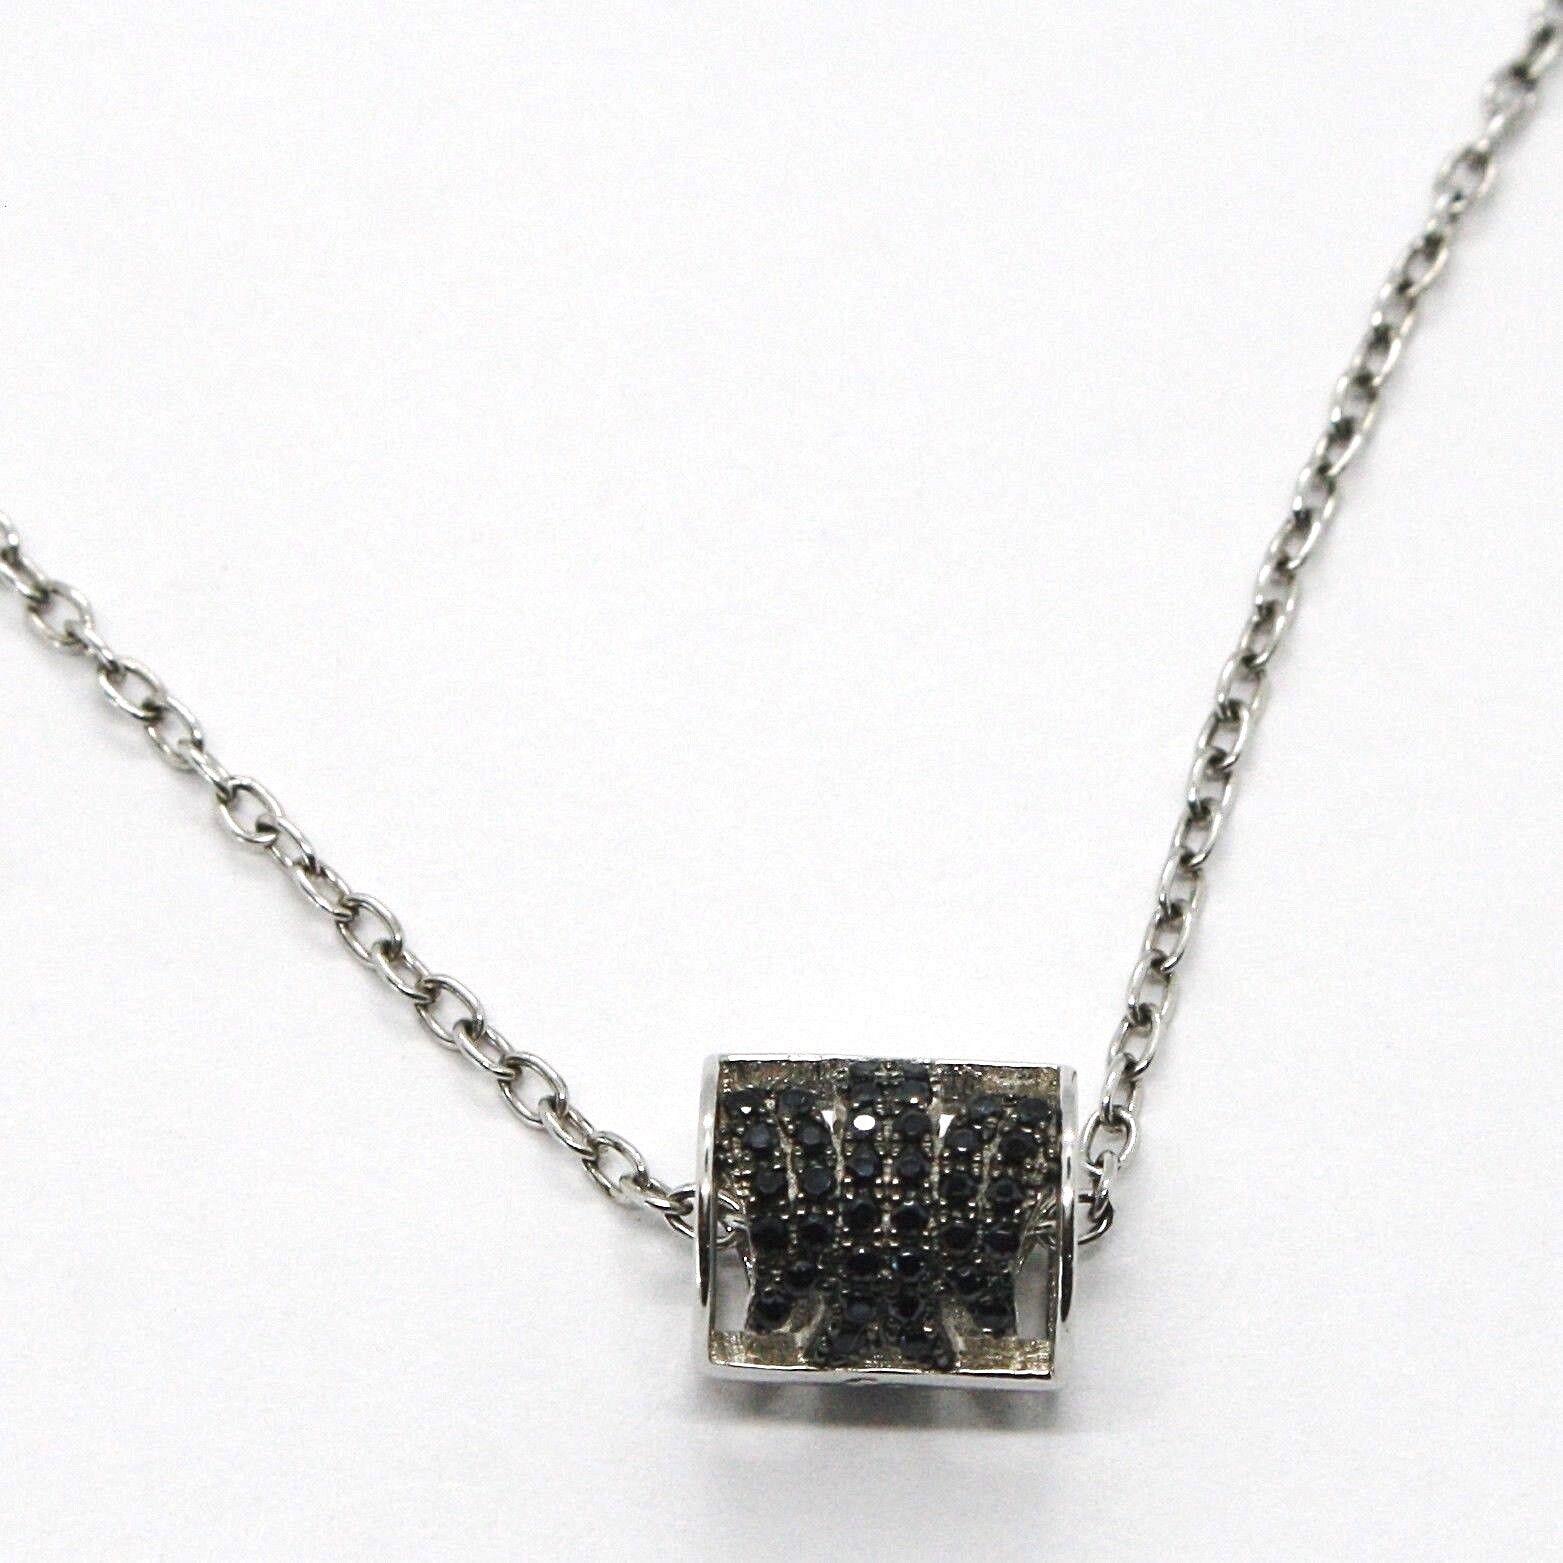 925 silverne Halskette,Schlauch Engel,Zirkonia blacke,Roberto Giannotti,